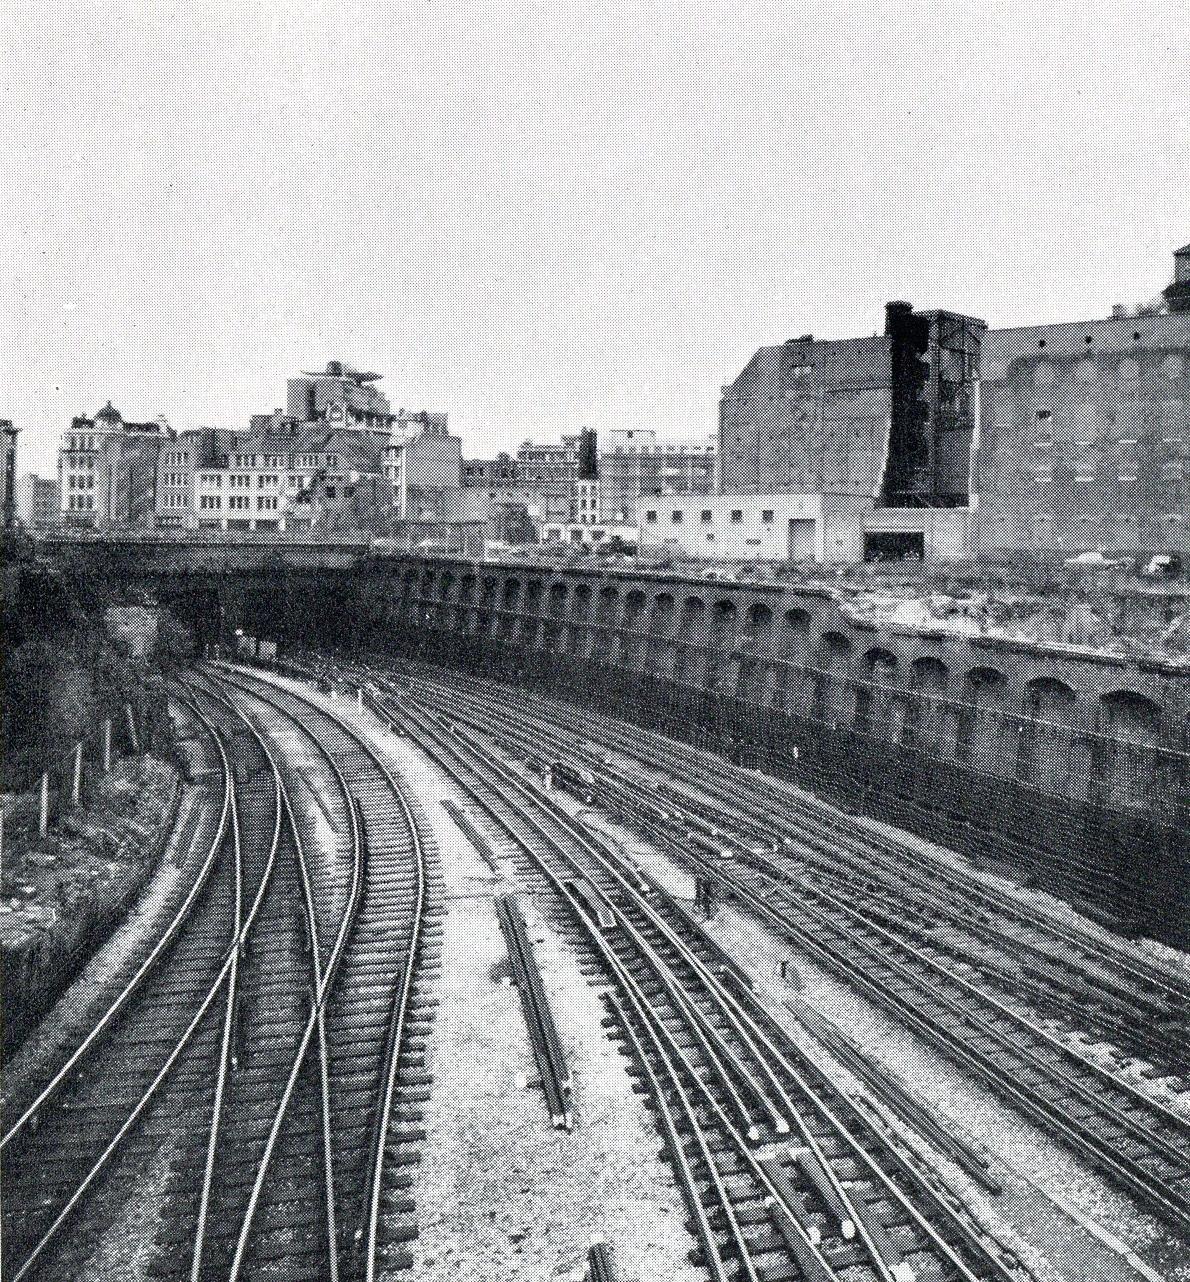 img 1959 0014 - A mystery London scene!